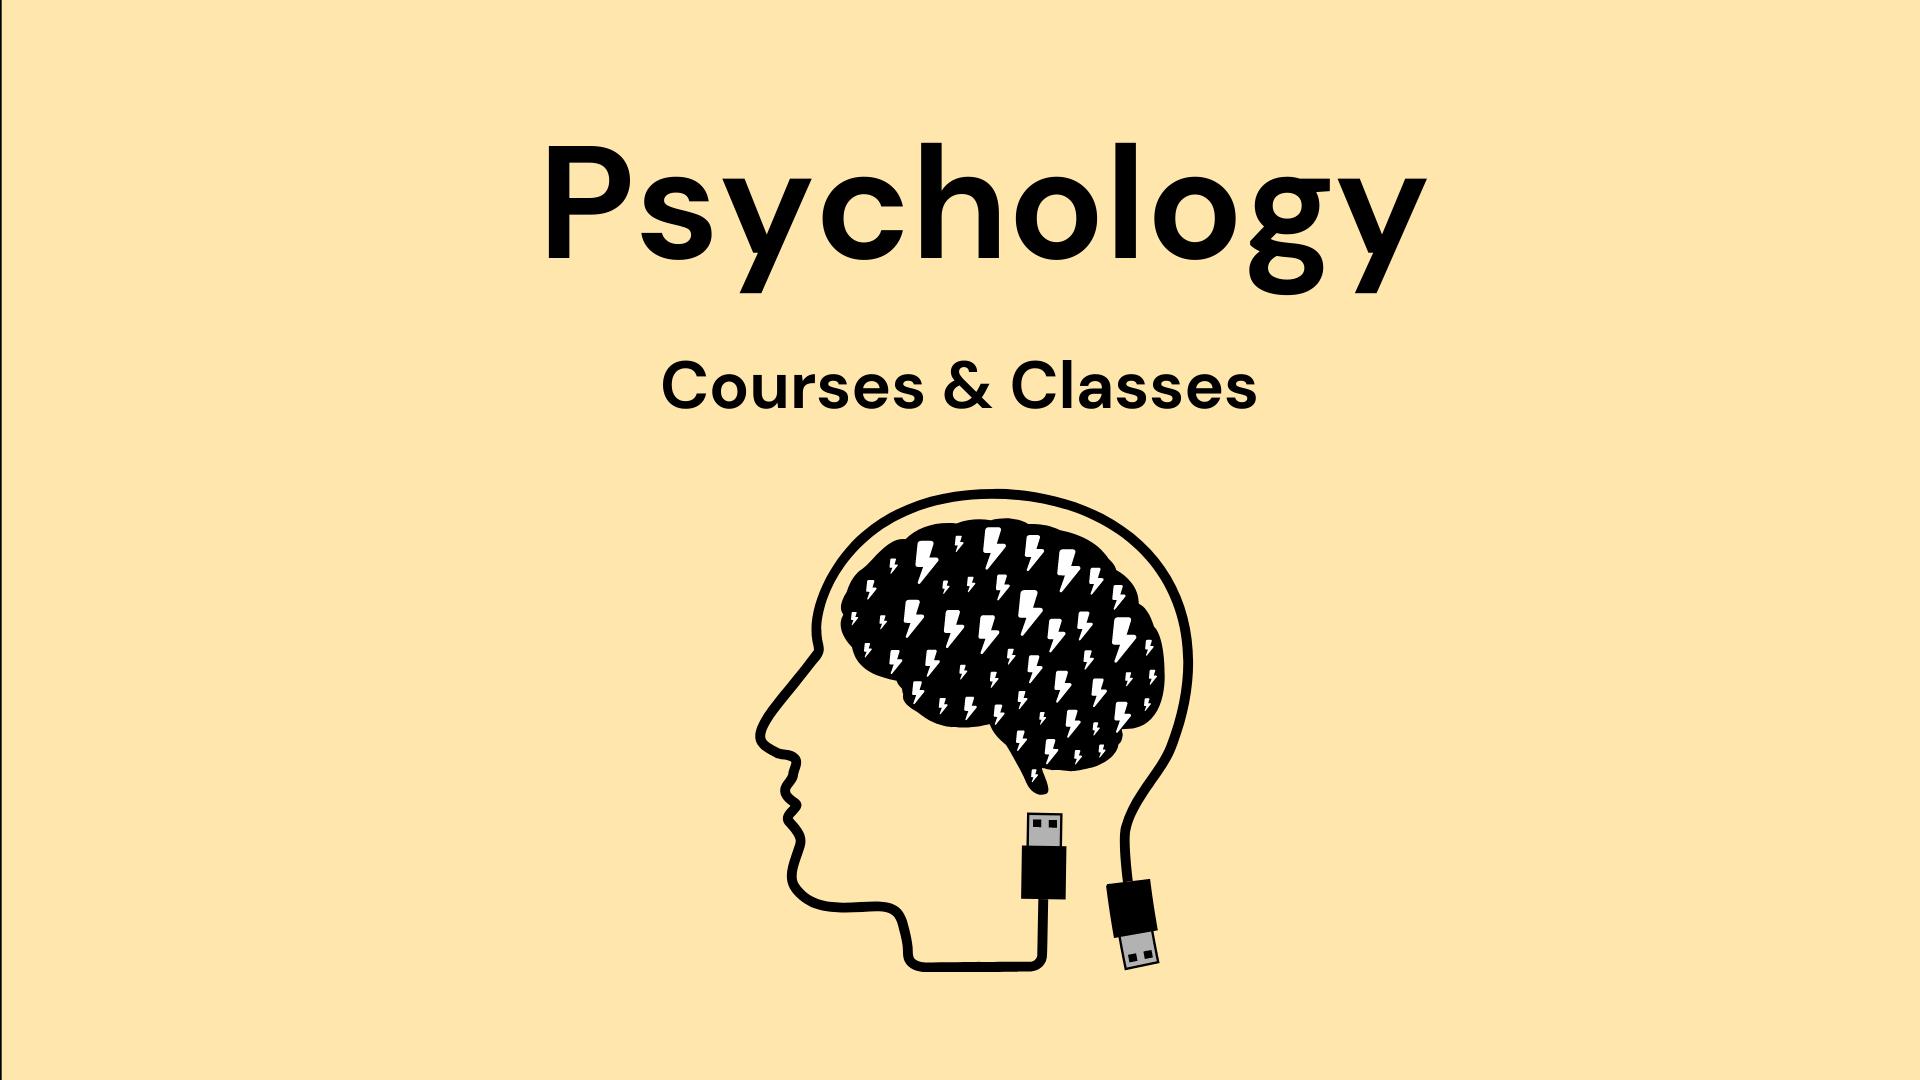 11 Best Psychology Courses & Classes - Learn Psychology Online